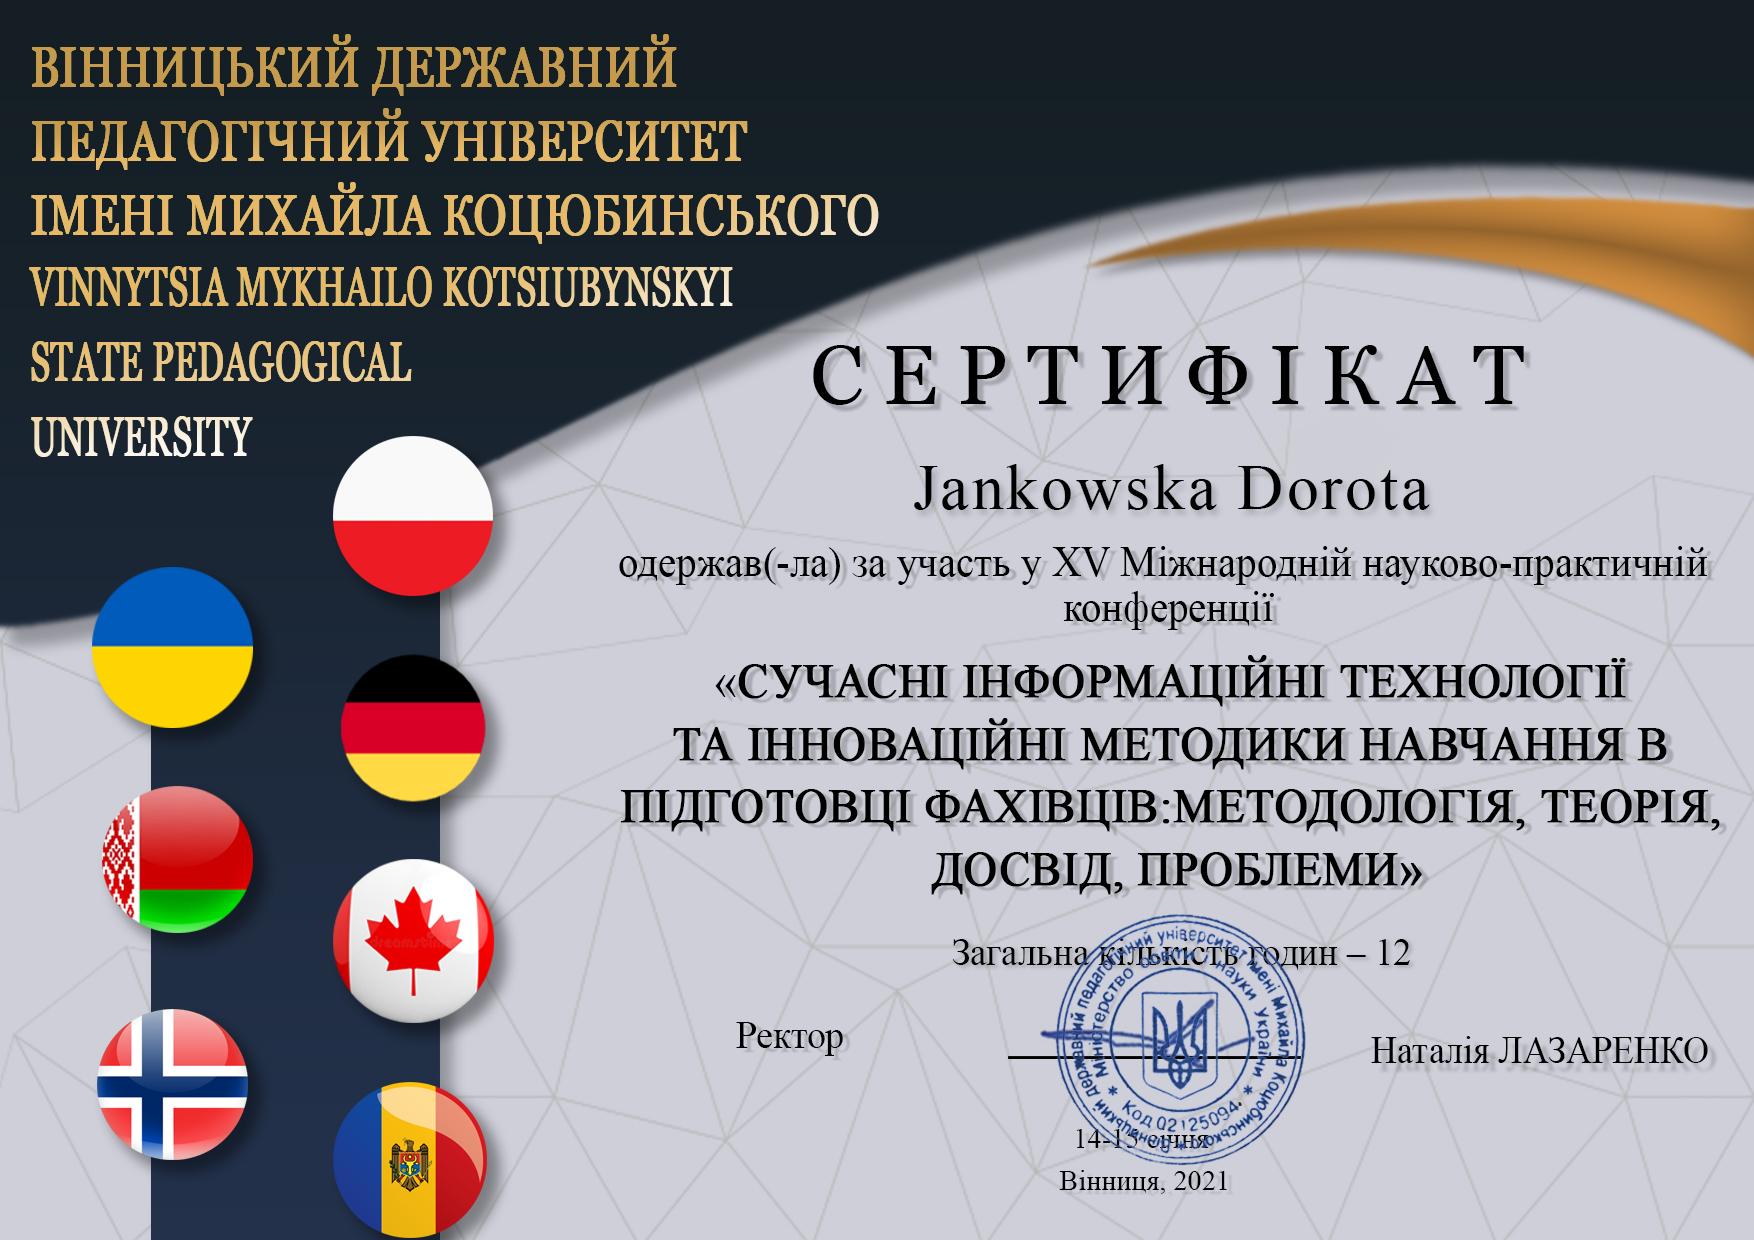 Jankowska Dorota